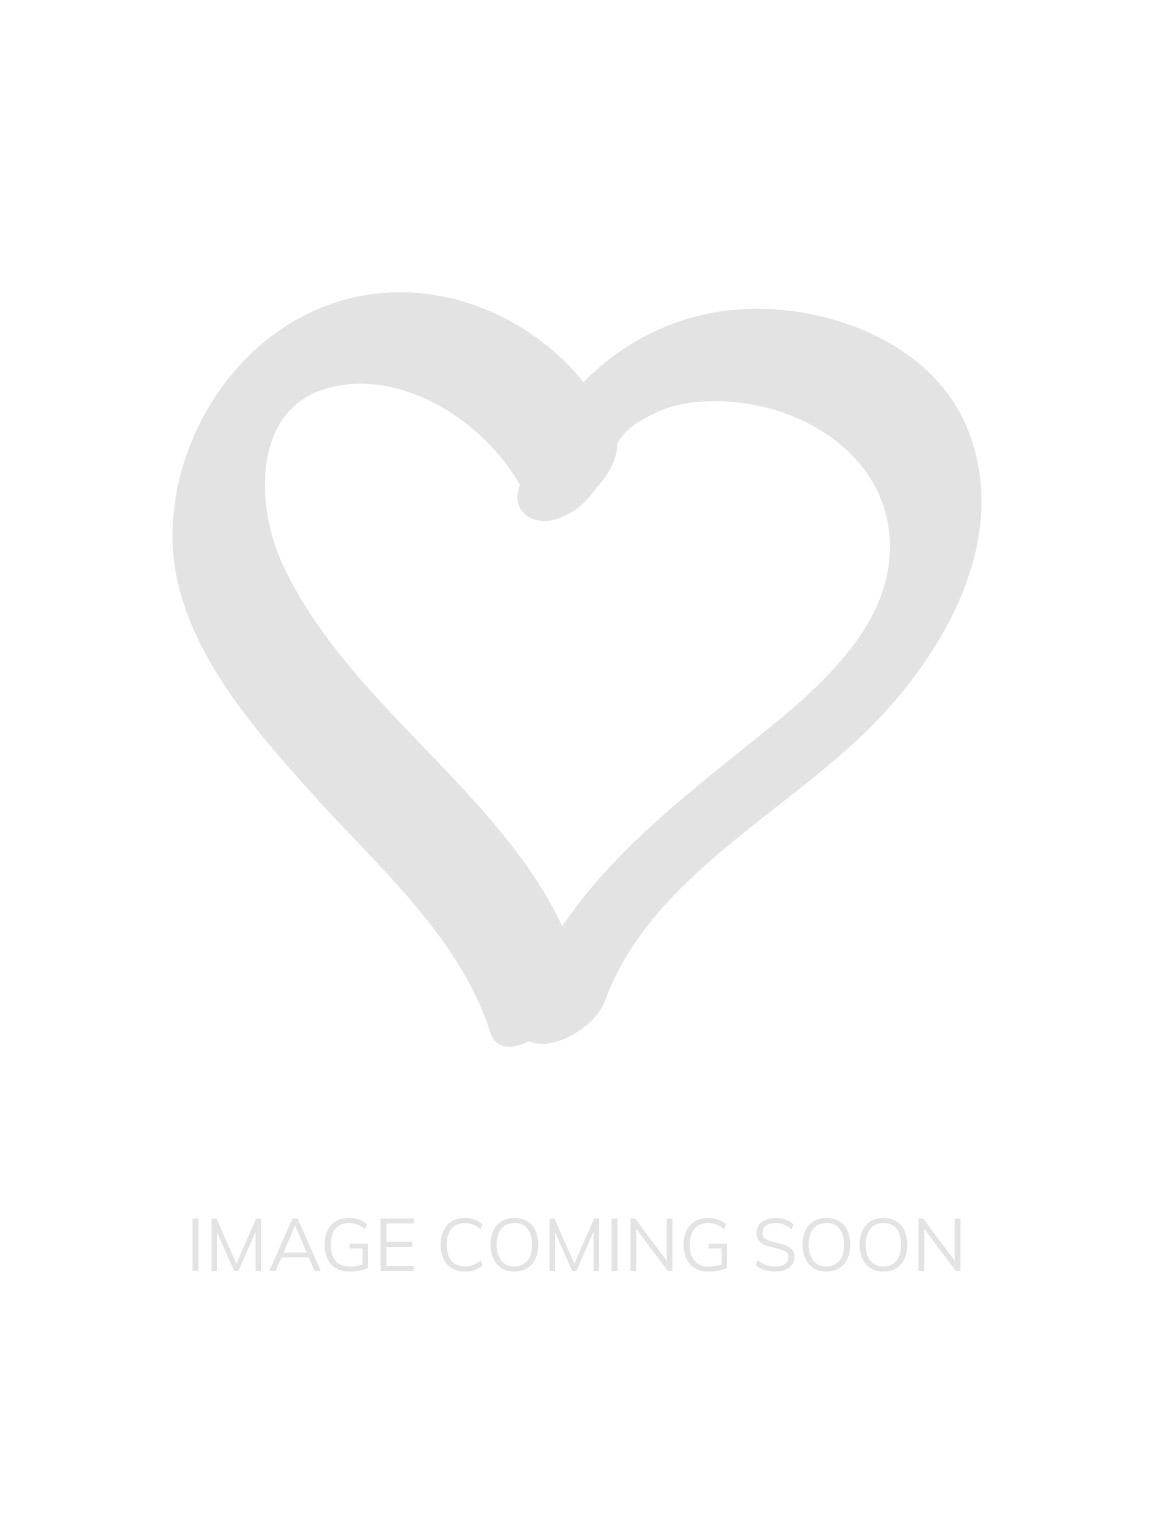 https://lingerieoutletstore.co.uk/media/catalog/product/cache/8b8552d7fff9d077495cfa8696b94610/t/j/tj_f_15.jpg